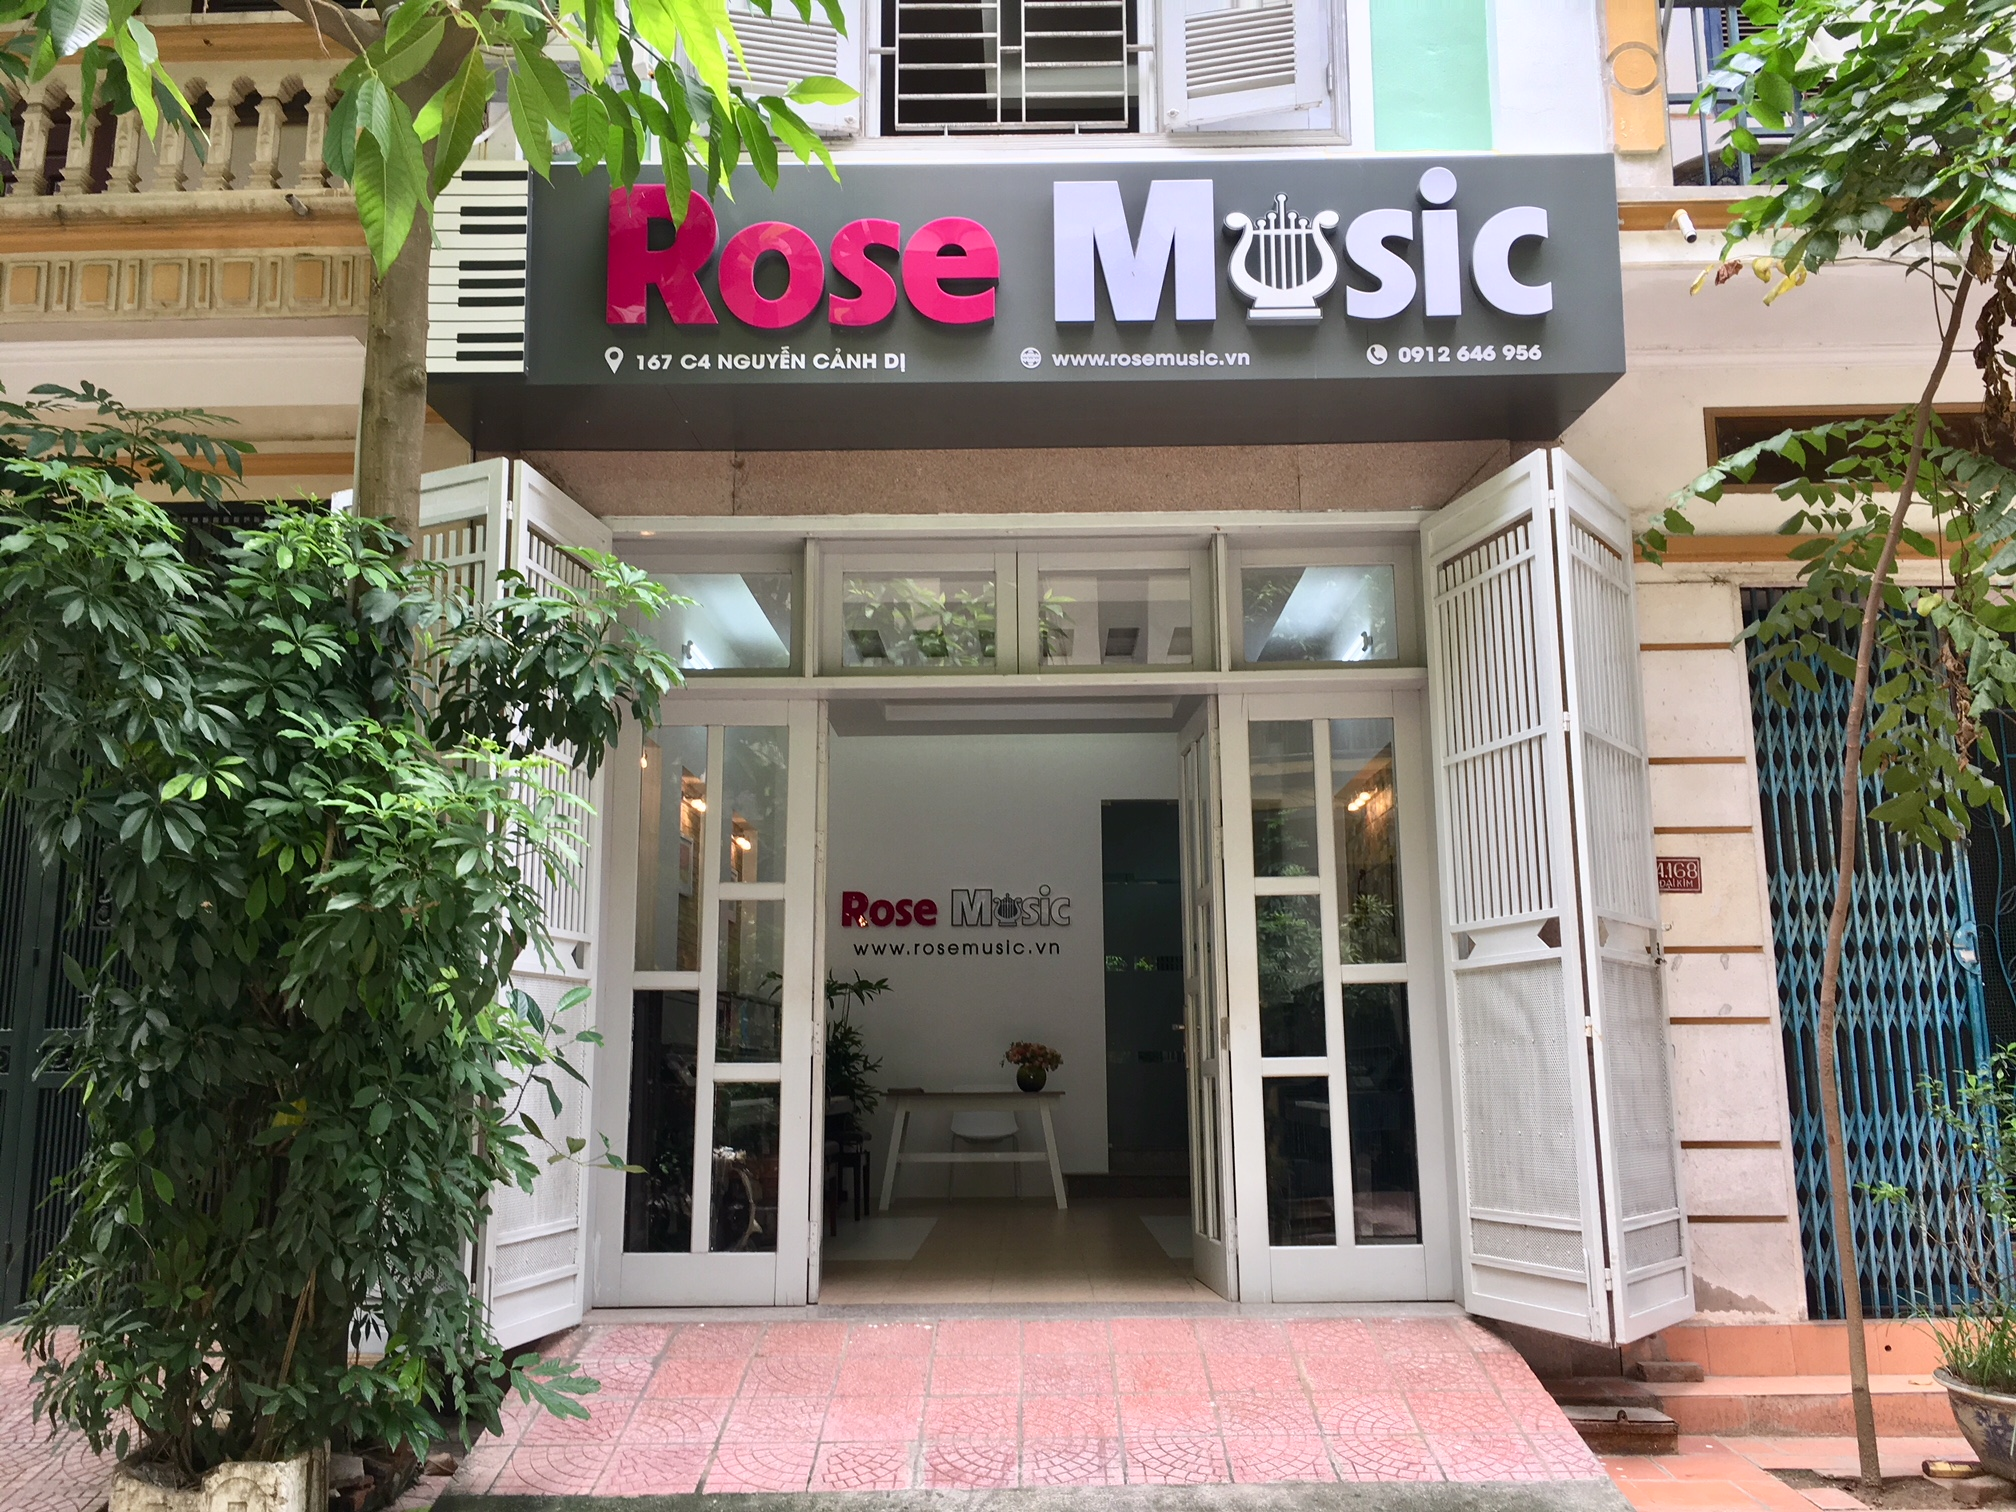 Rose Music